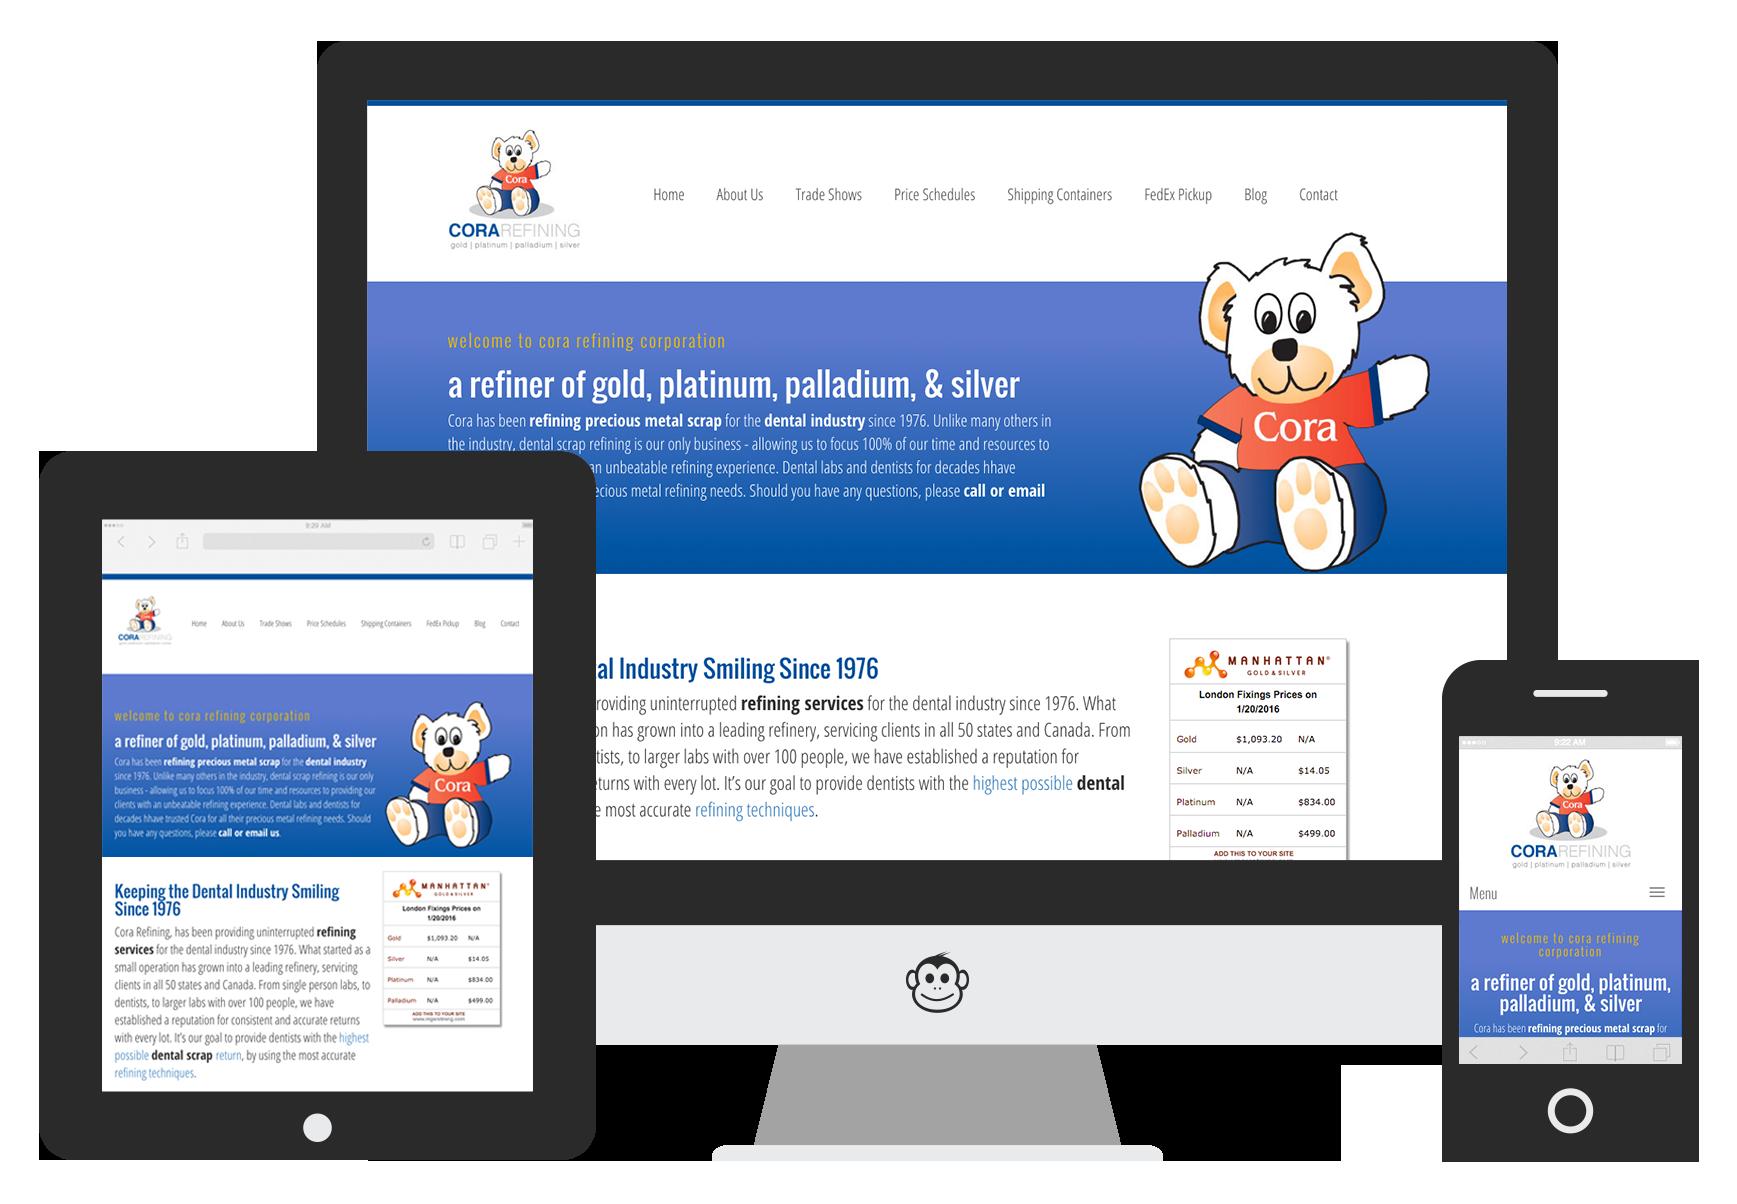 https://www.logicwebmedia.com/wp-content/uploads/multi-platform-web-design-cora.png